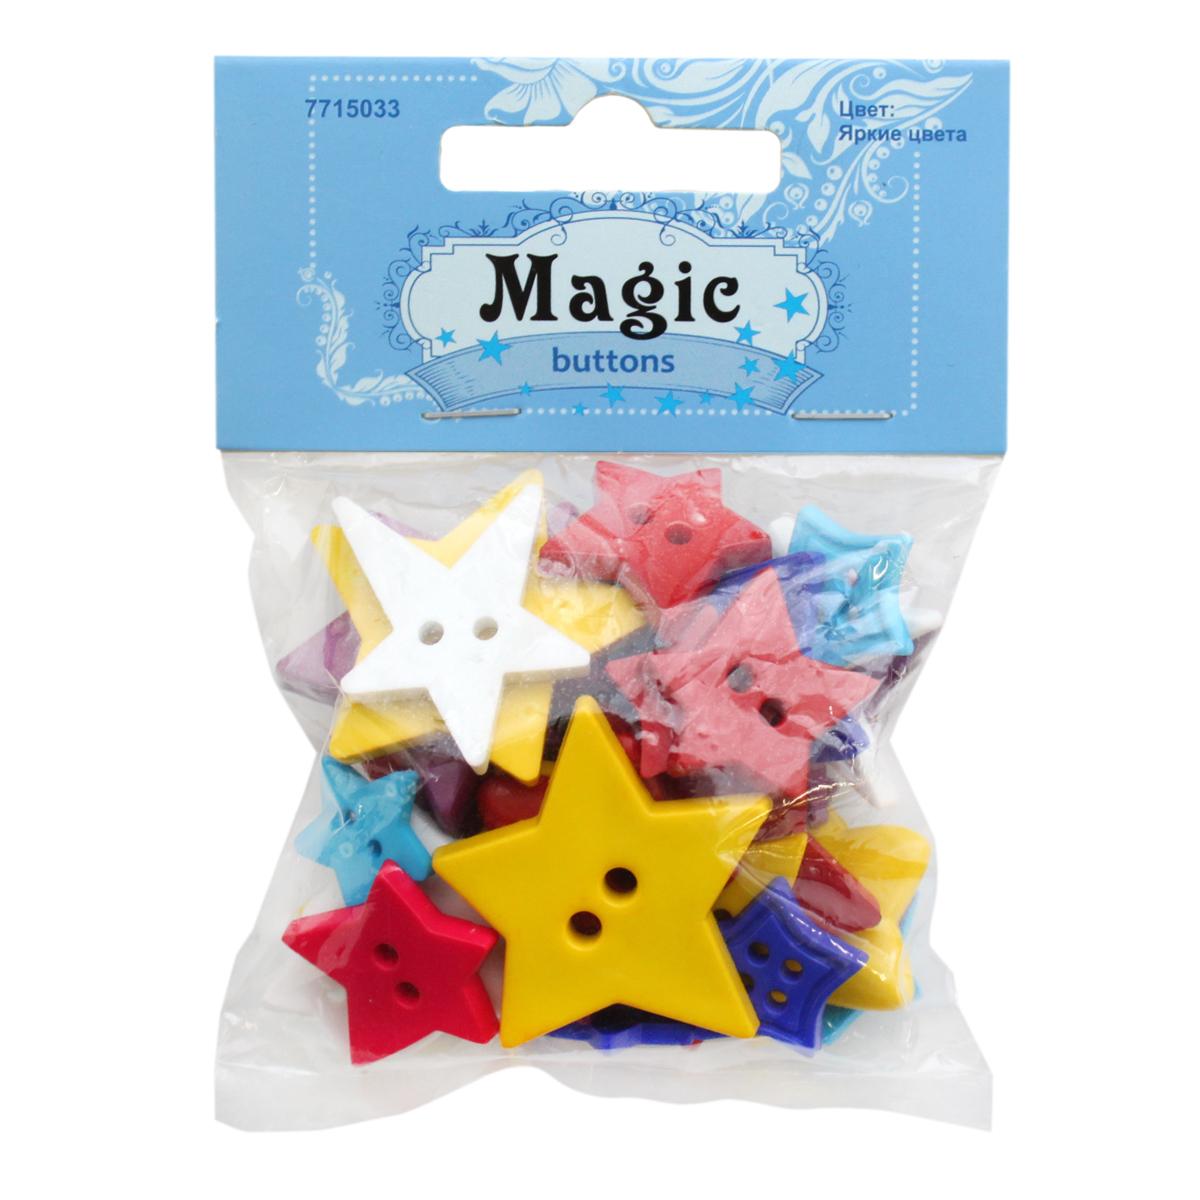 �������� ������������ Magic Buttons ������. ����� �����, 30 �7715033_����� ���������� � ��������� �������� Magic Buttons ������ ���������� ����������� � ������ ������. �������� ��������� � ������ �������� ��������� � ������.